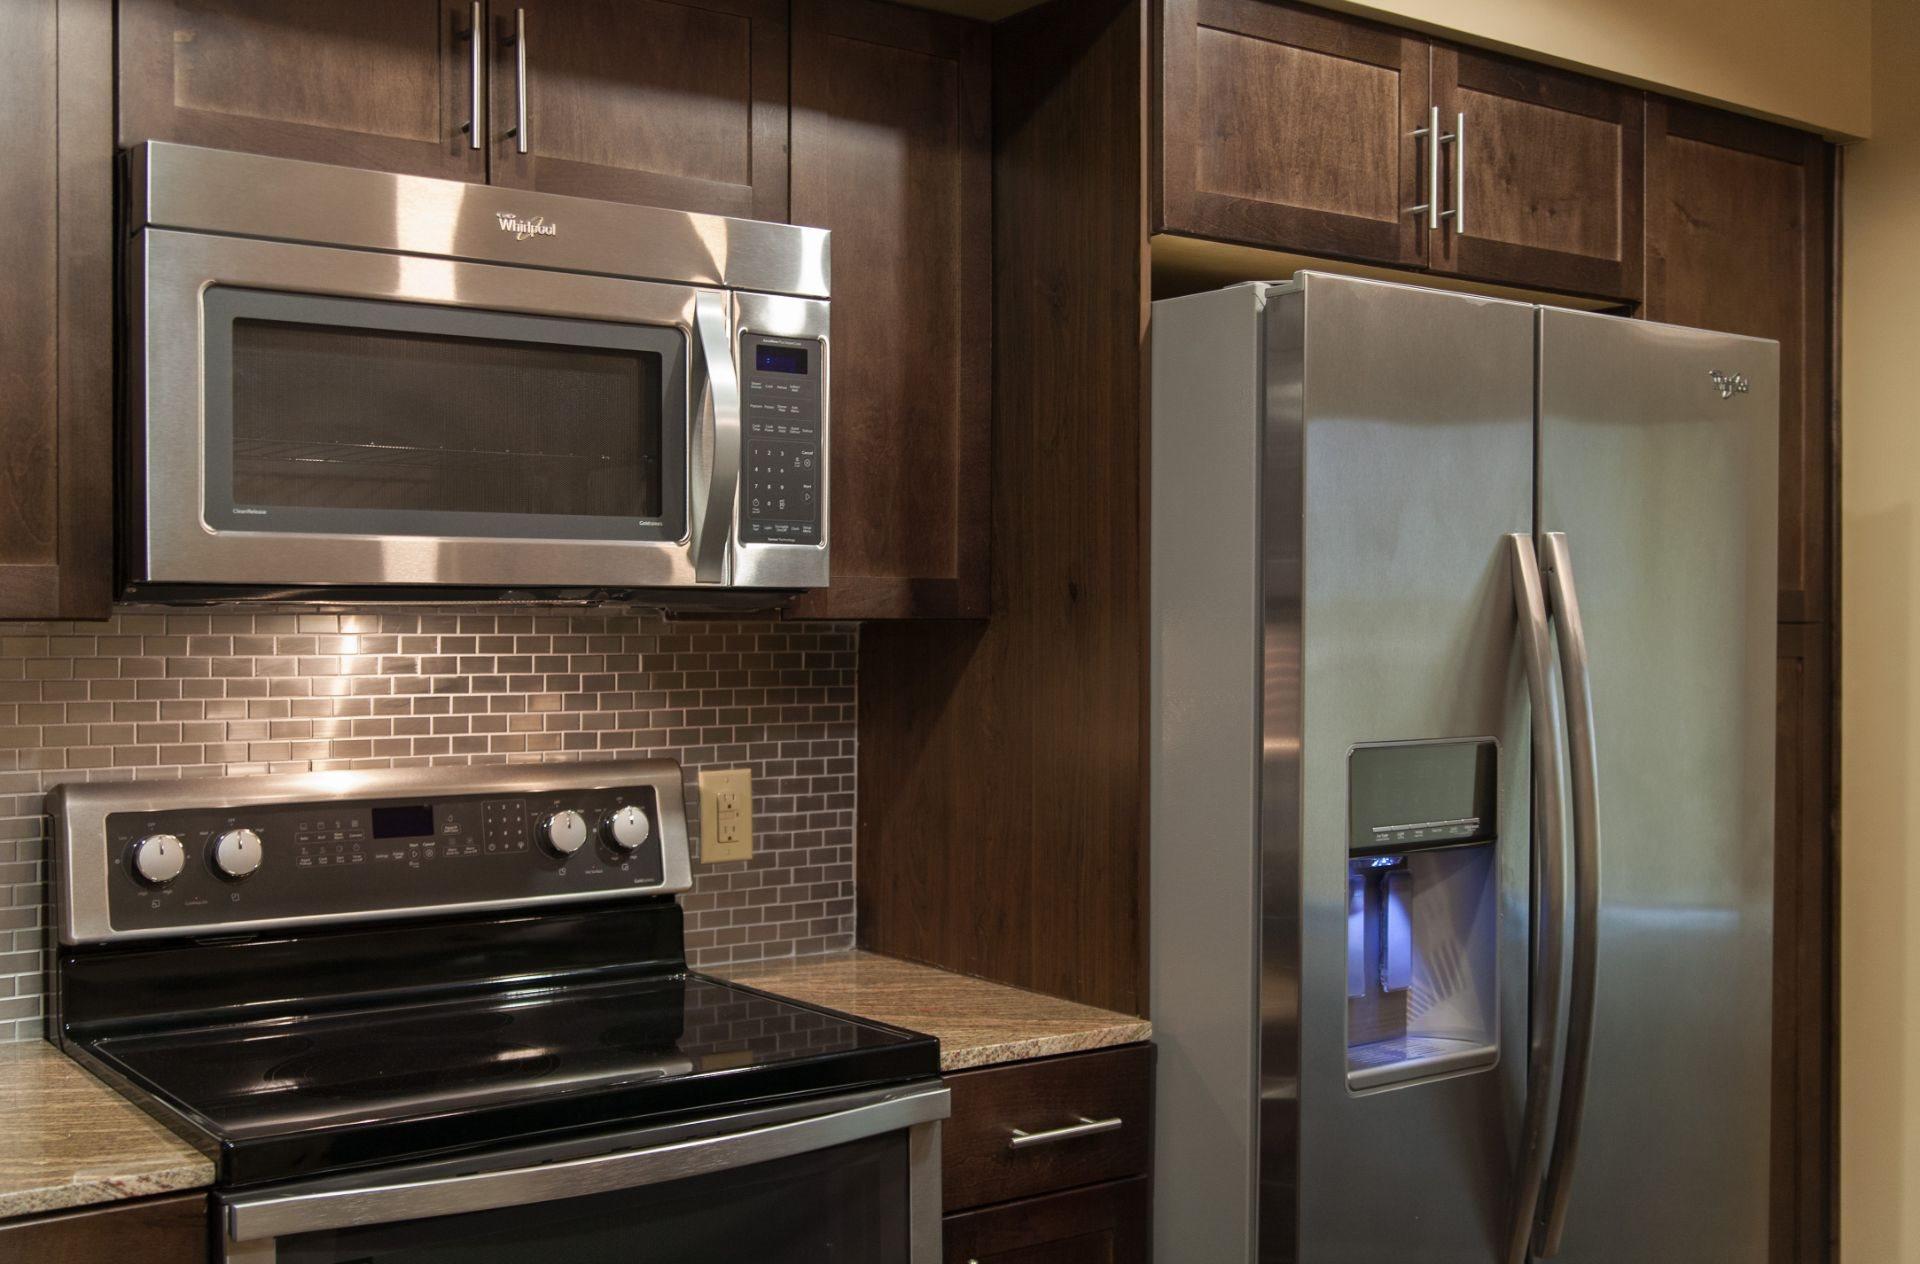 Refrigerator And Kitchen Appliances at Berkshire Riverview, Austin, 78741